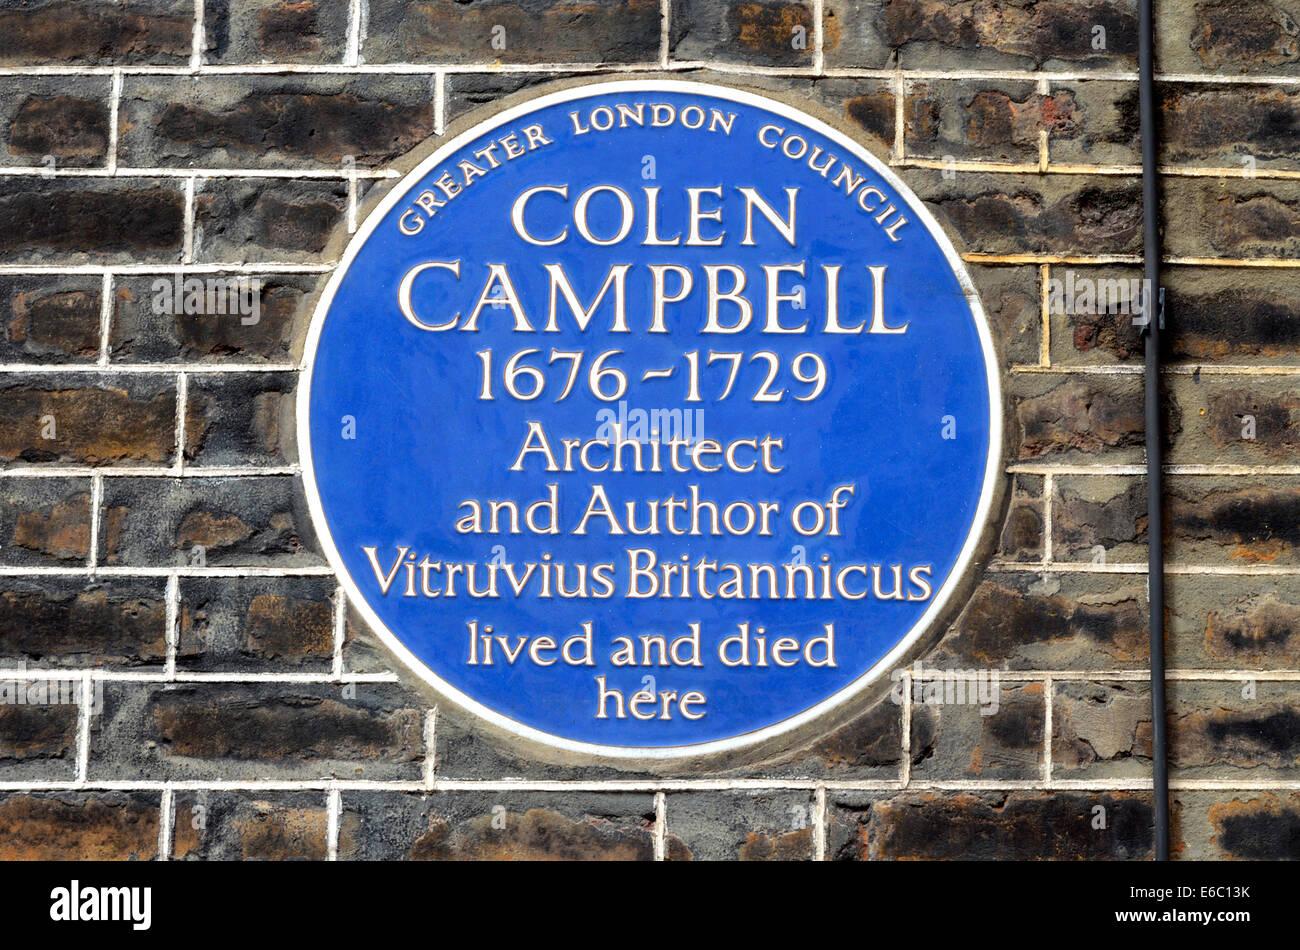 London, England, UK. Commemorative Blue Plaque: Colen Campbell (1676-1729: architect and author of Vitruvius Britannicus) - Stock Image